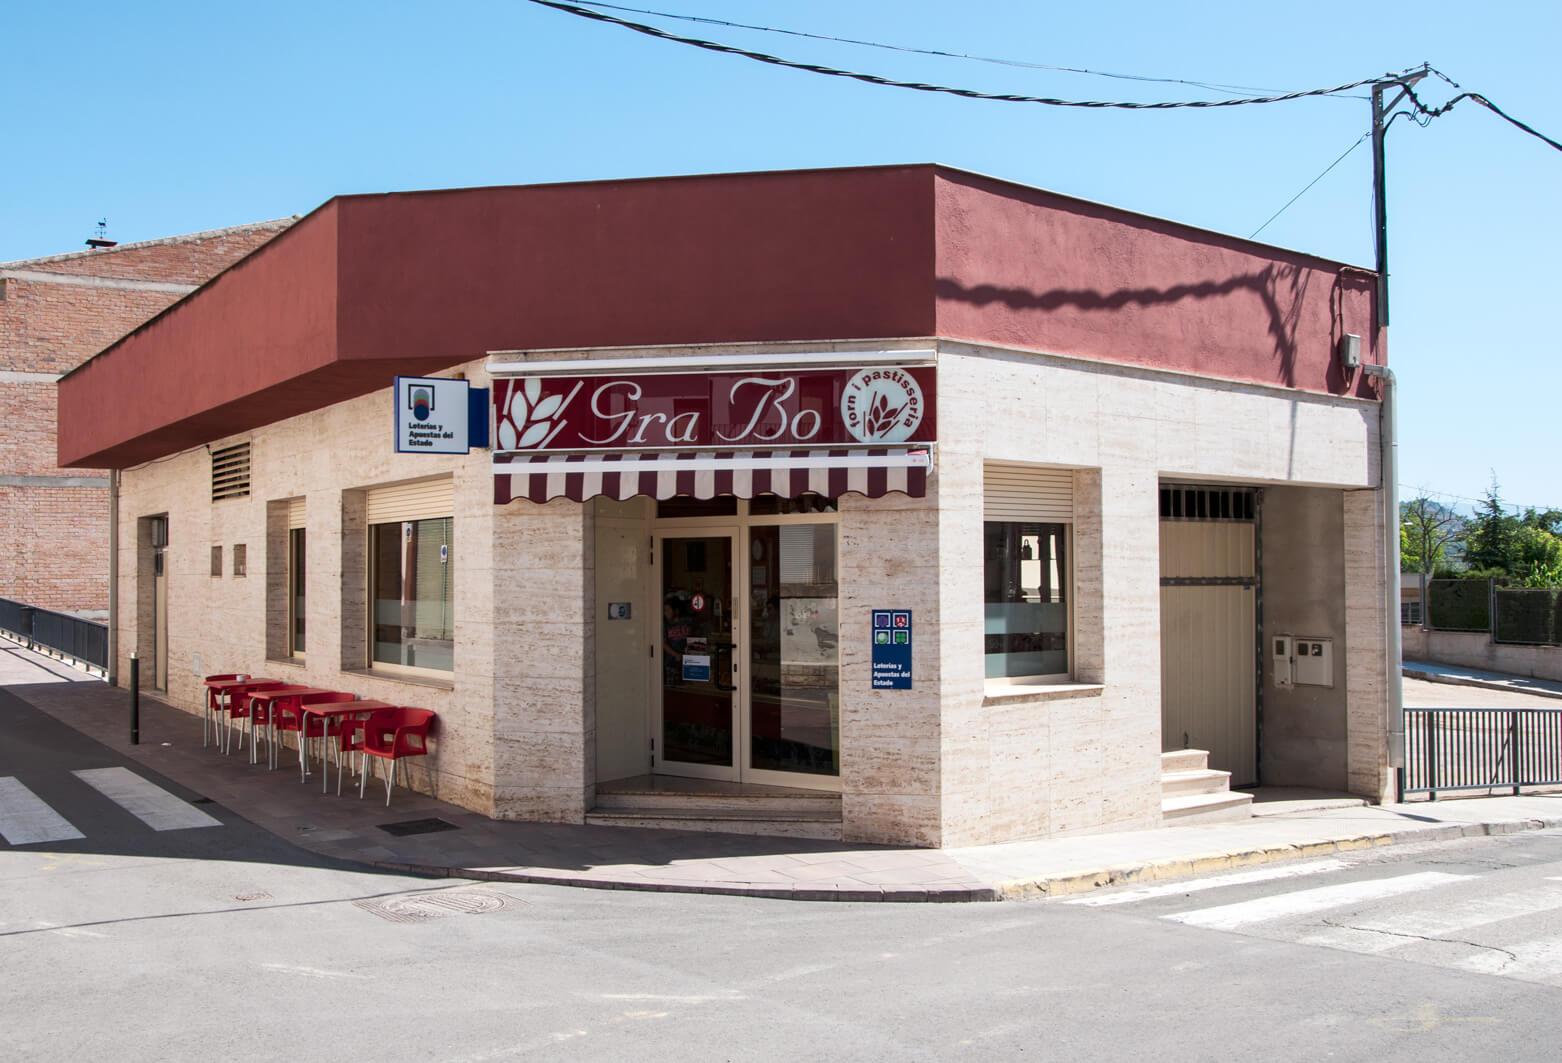 Forn i Pastisseria Gra Bo – Ascó Turisme